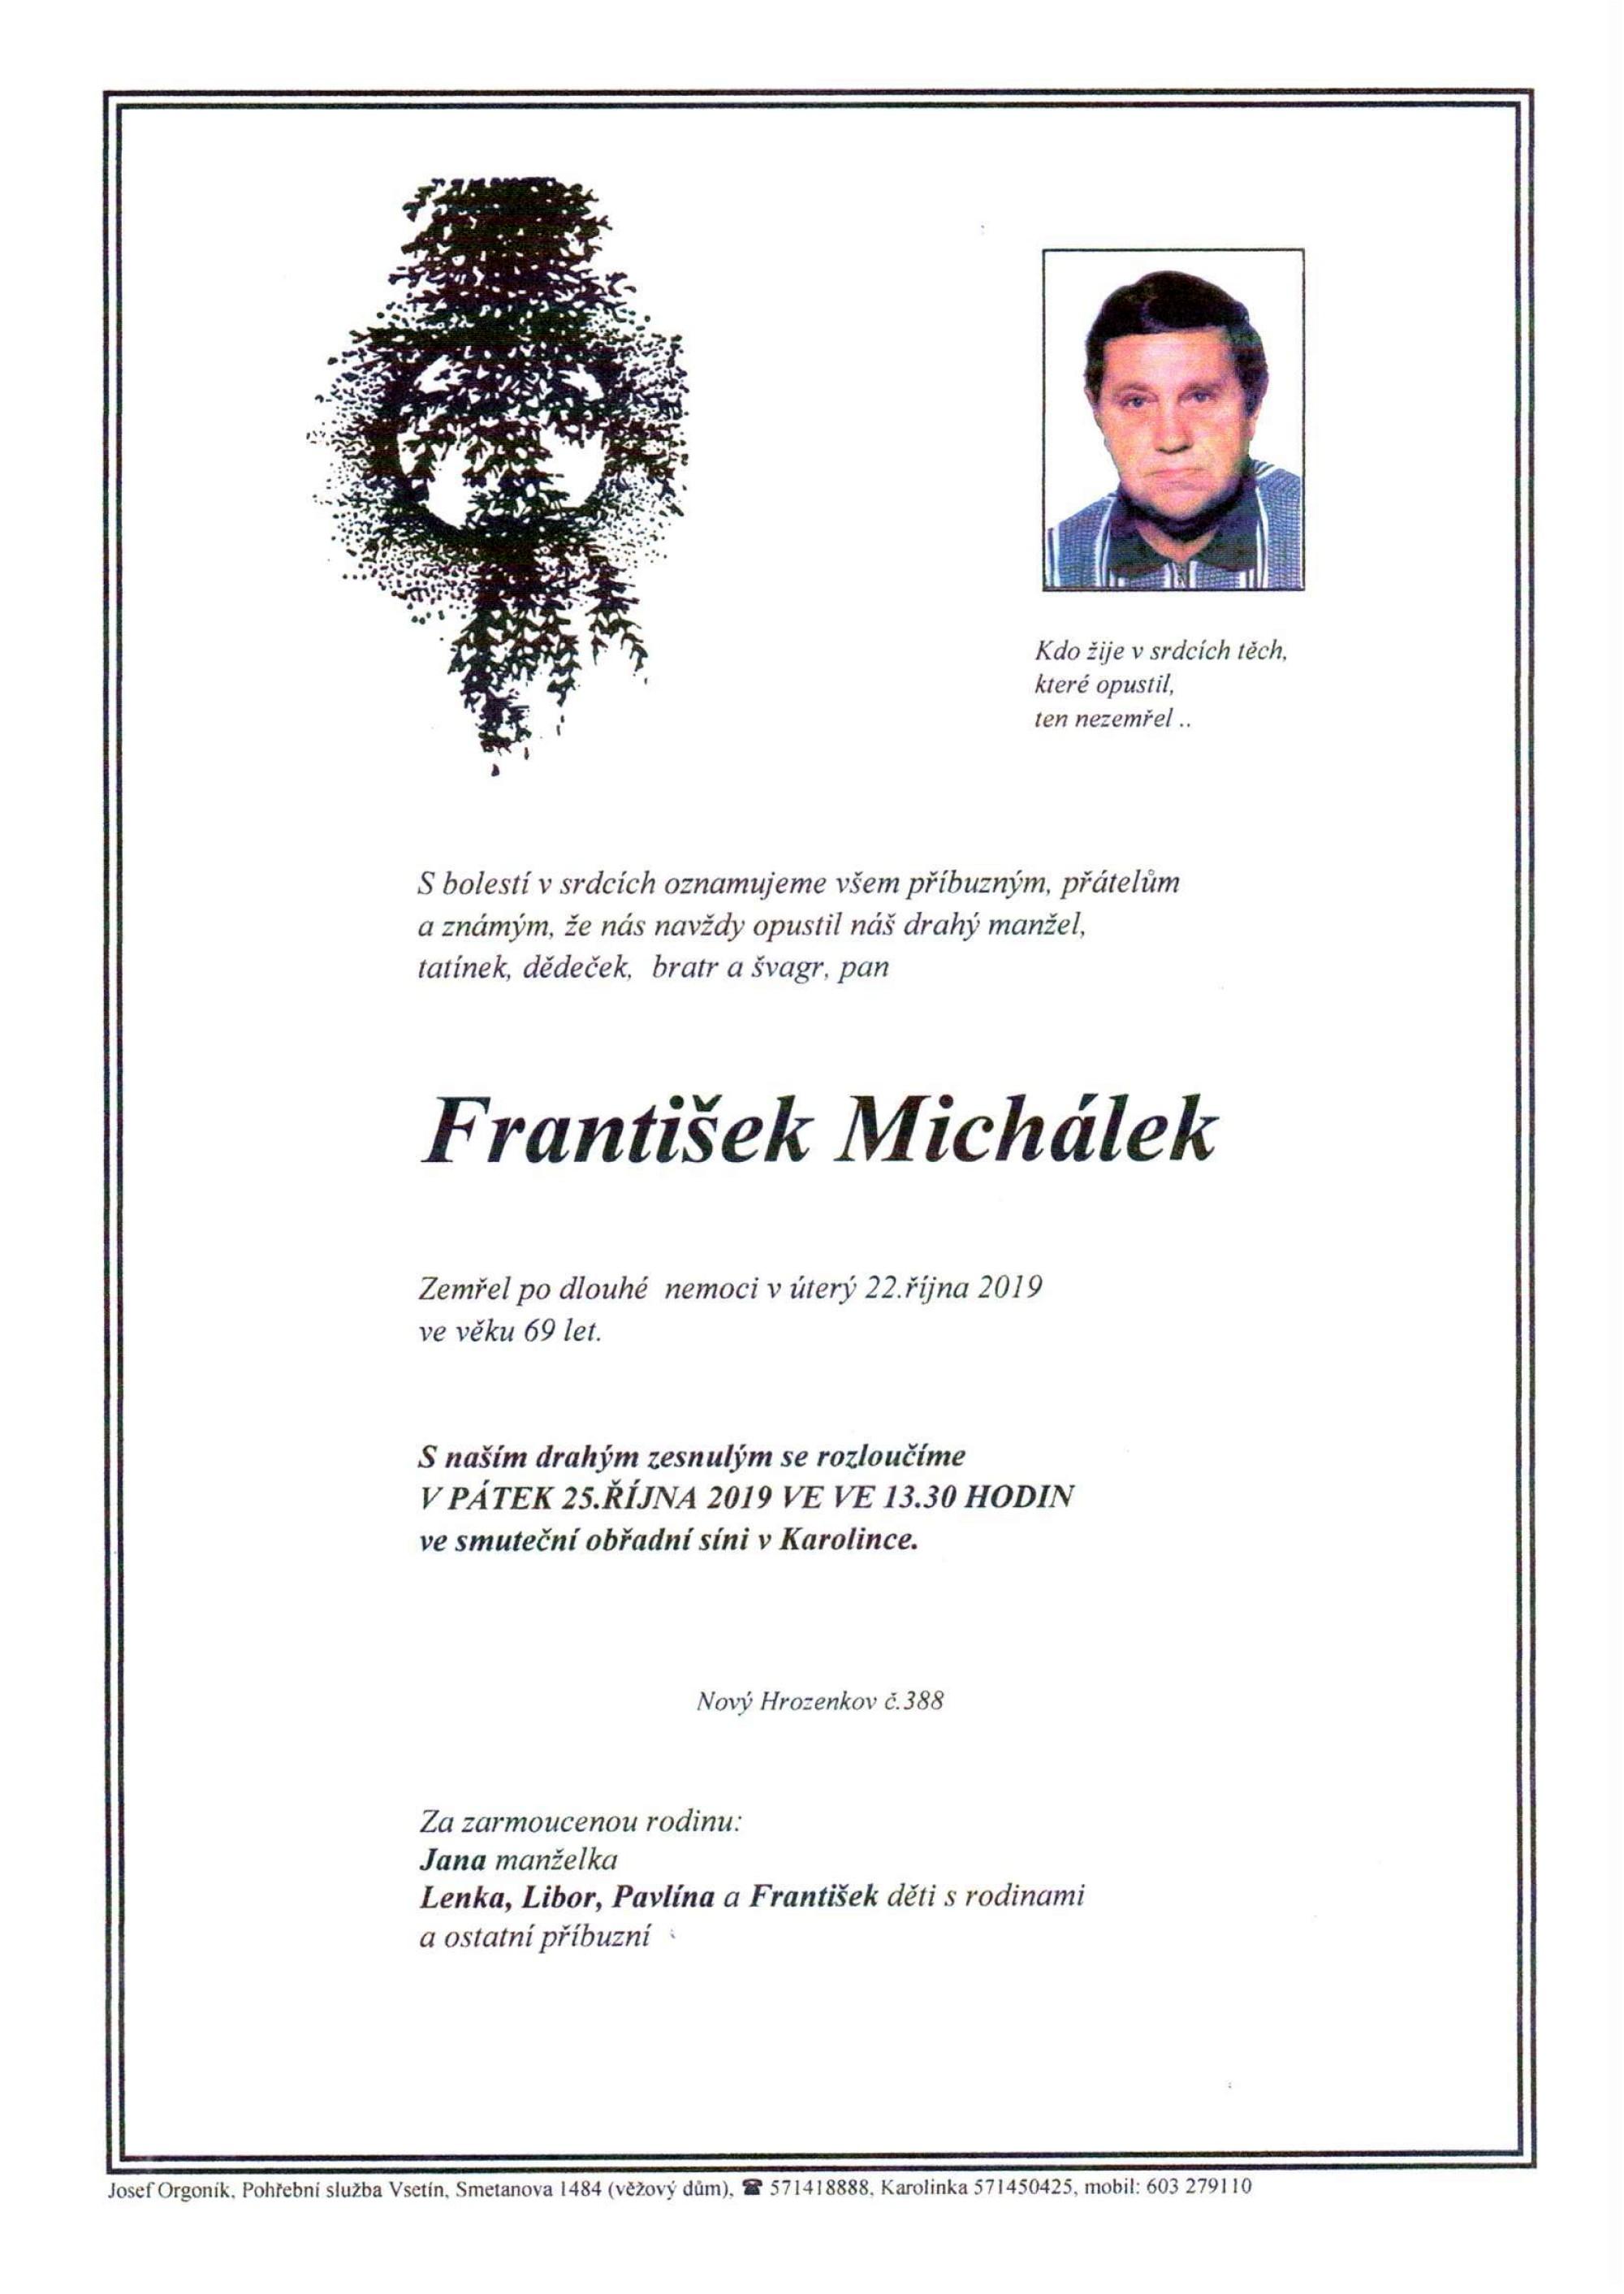 František Michálek